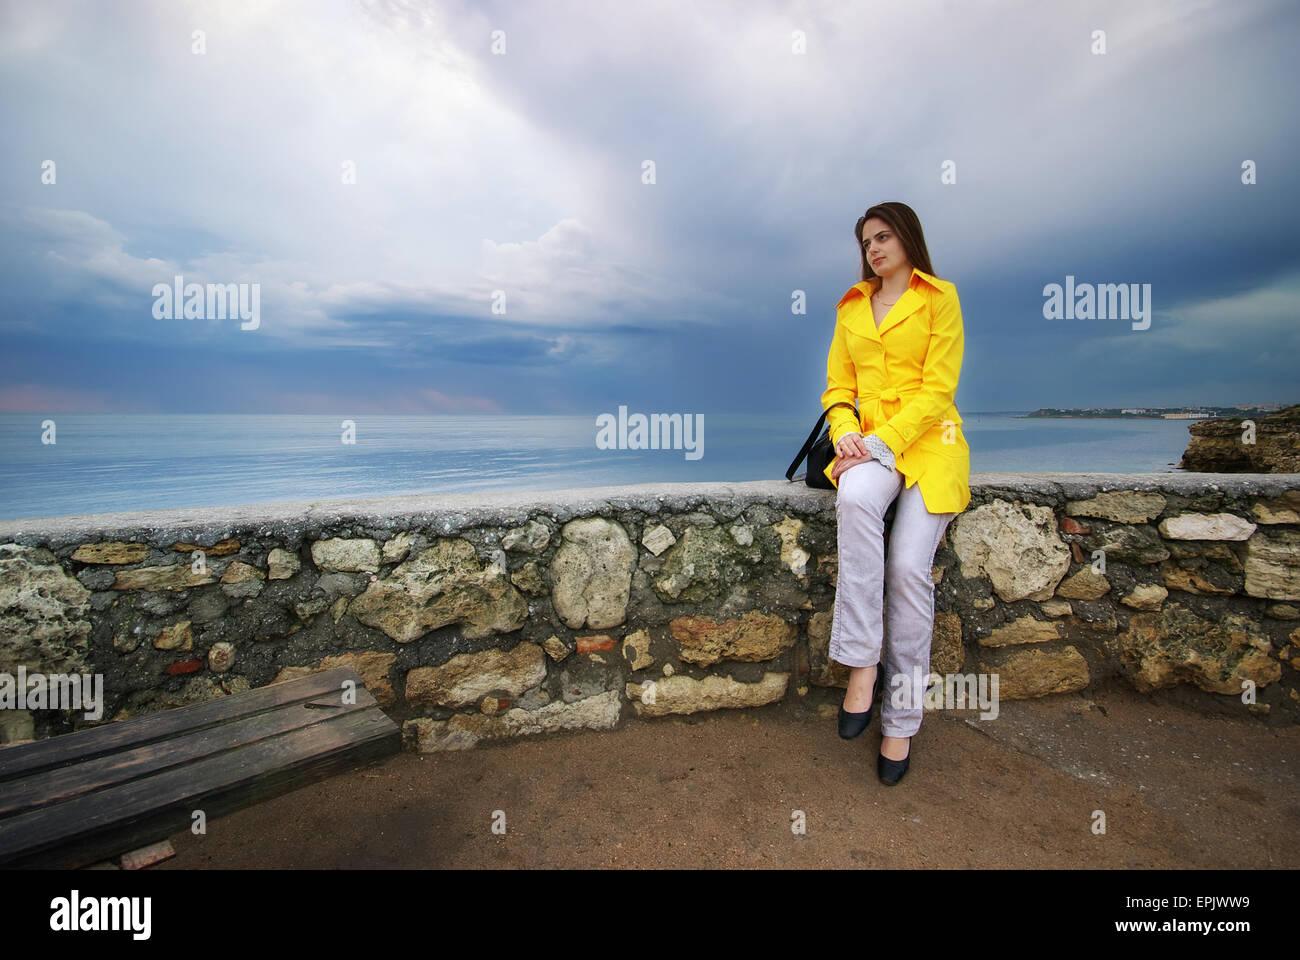 Girl sit on the border. Conceptual scene. - Stock Image